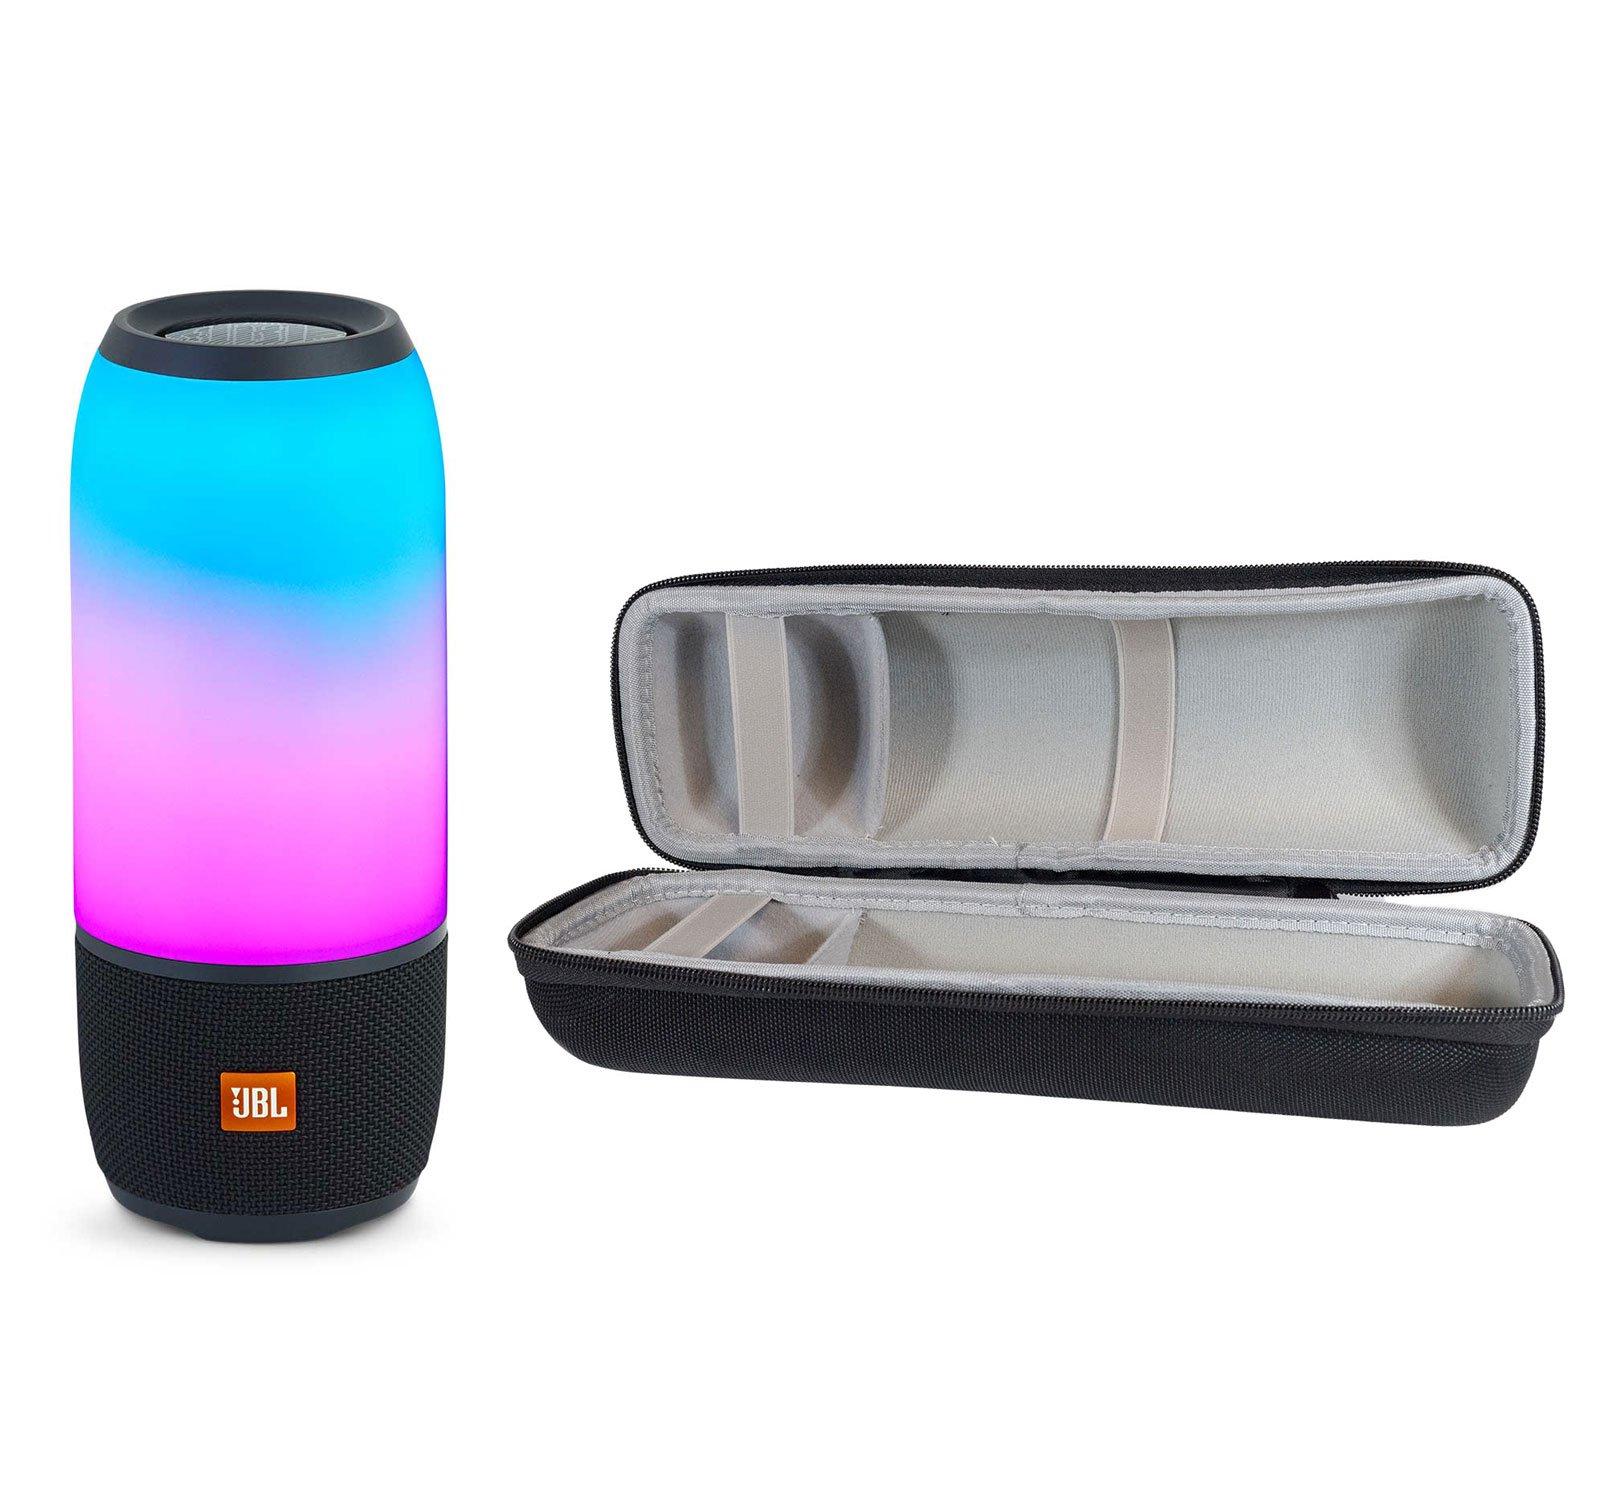 JBL Pulse 3 Wireless Bluetooth IPX7 Waterproof Speaker, Black, with Portable Hardshell Travel Case by JBL